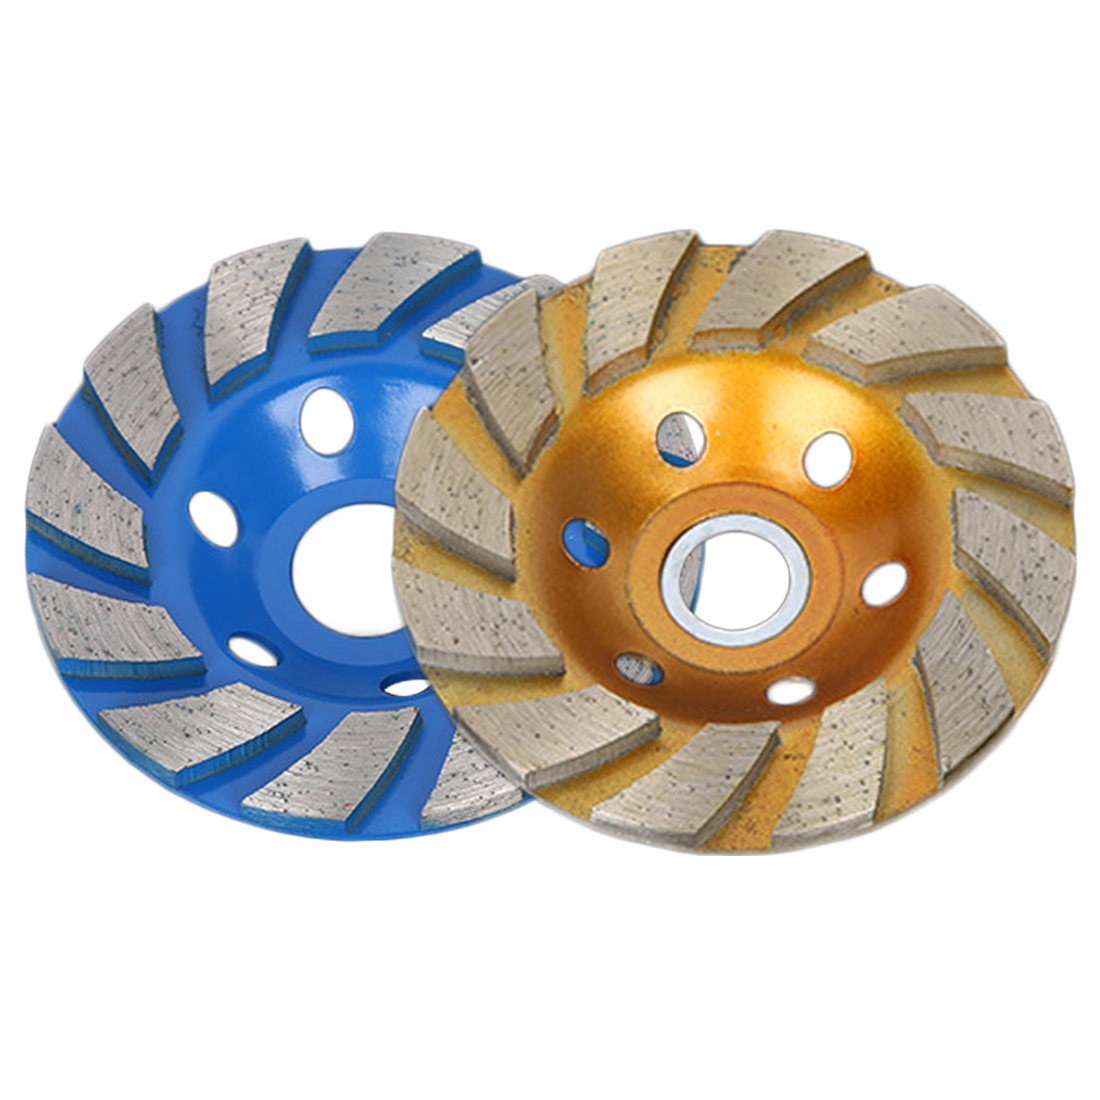 Exquisite Polishing Abrasive Wheel New 100mm Diamond Grinding Wheel Disc Concrete Masonry Granite Stone Tool